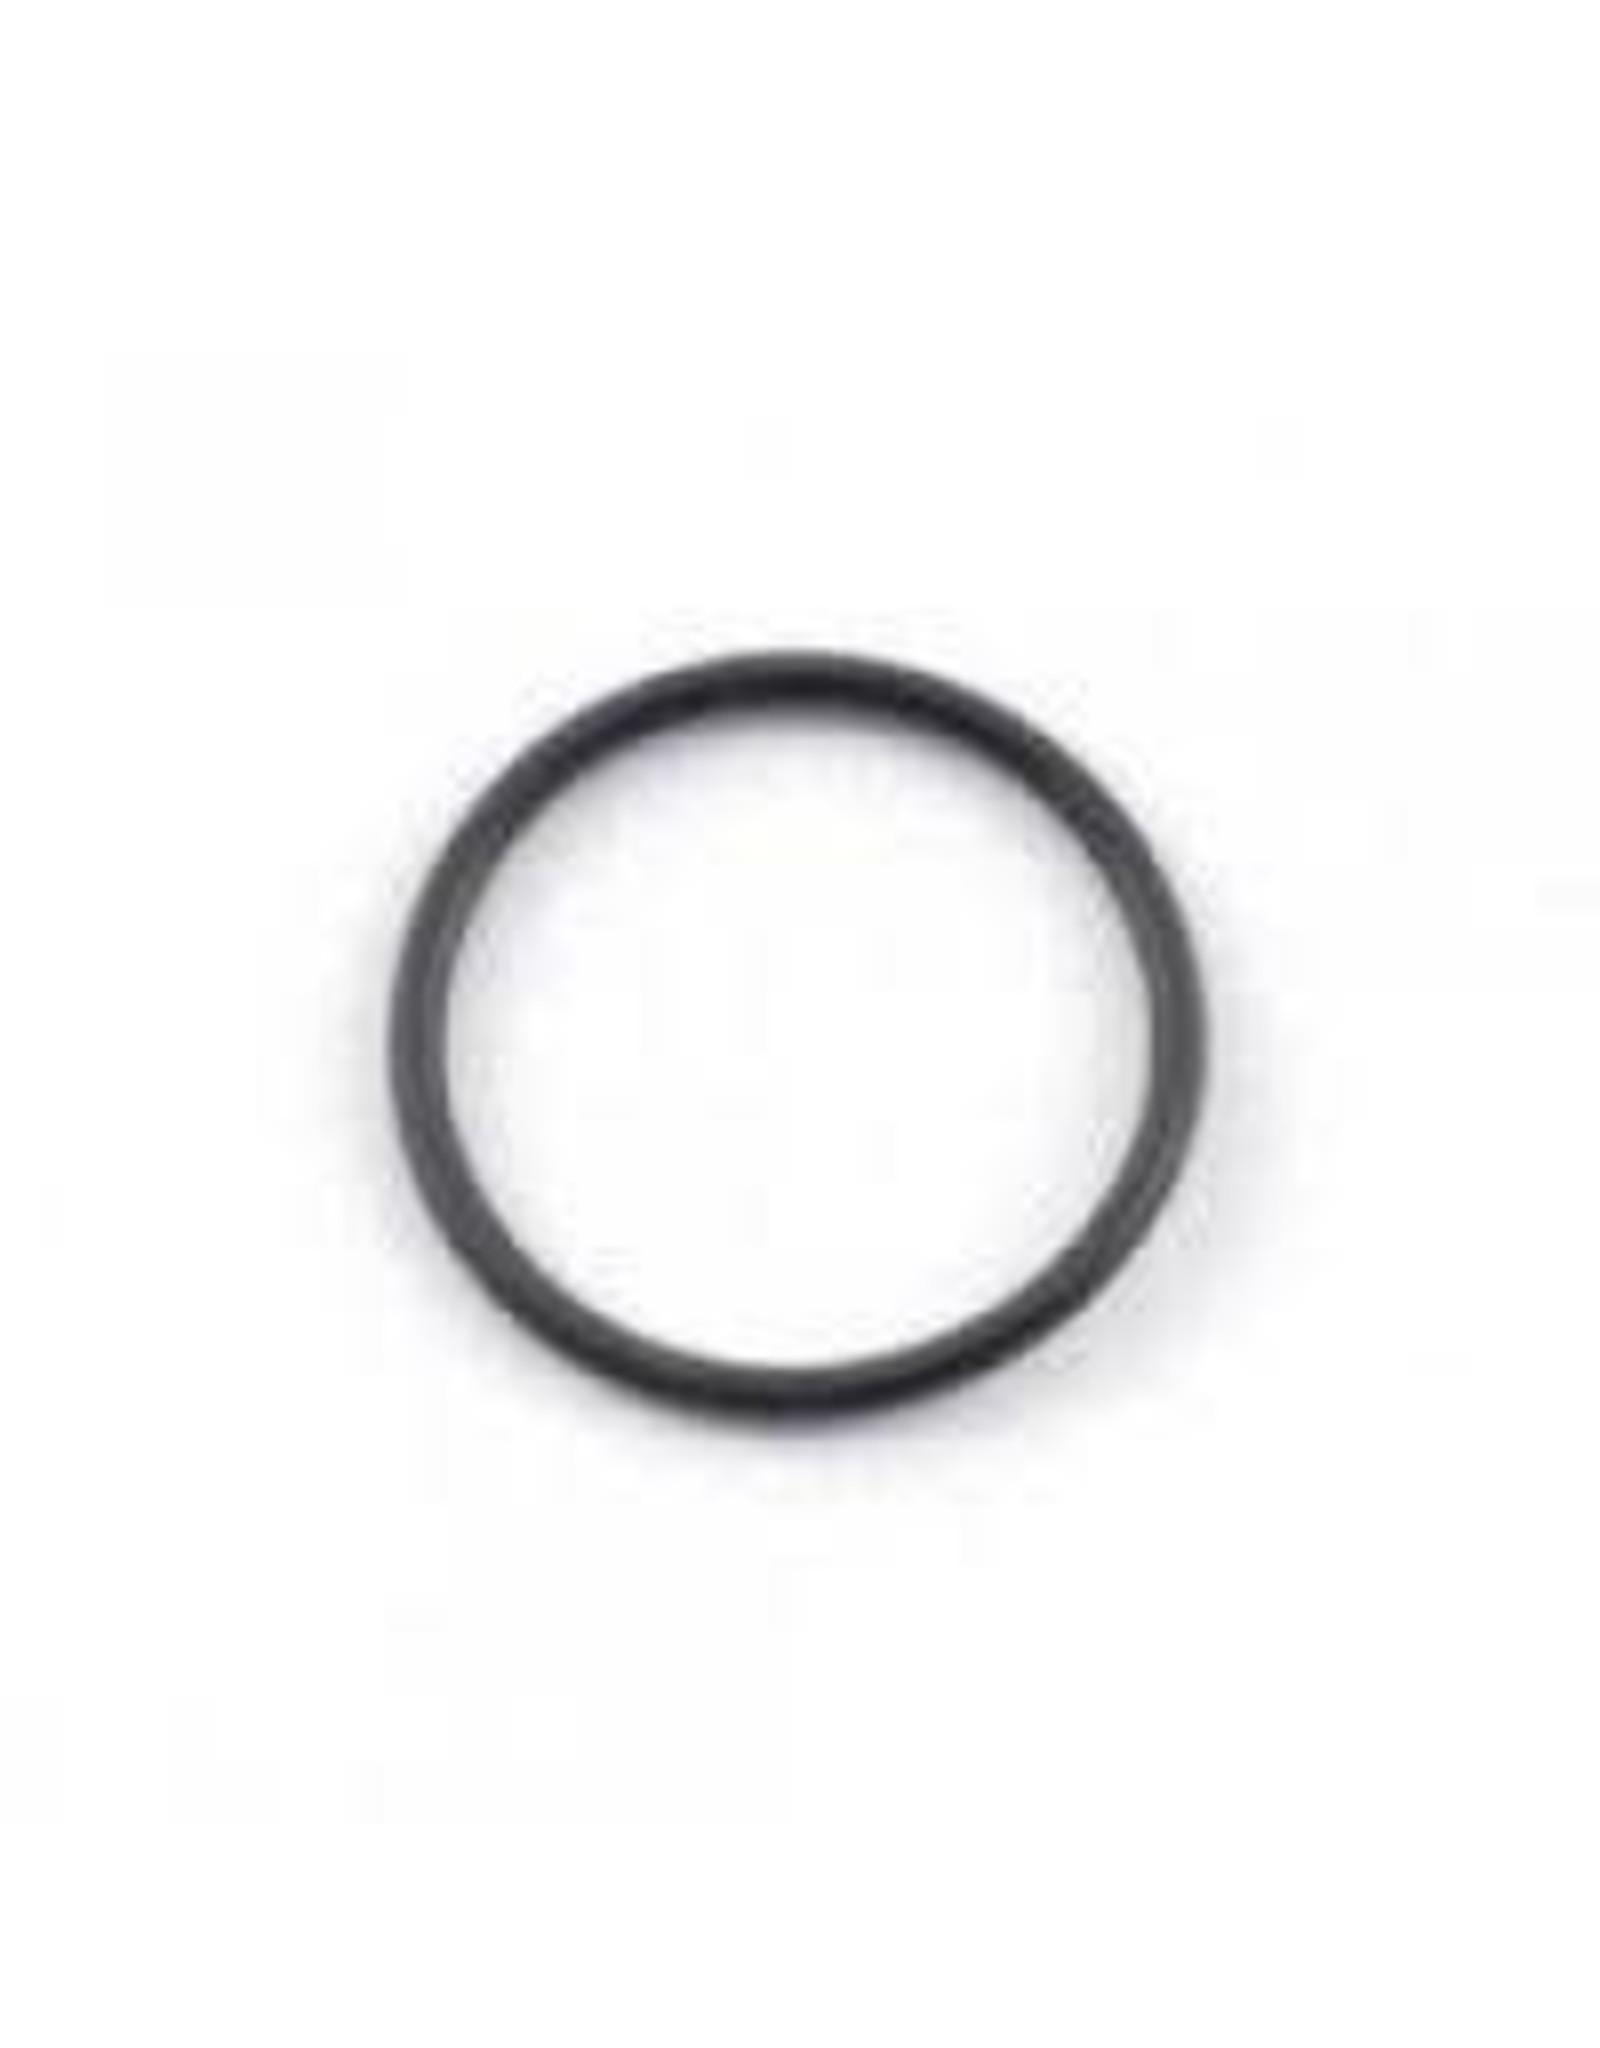 Graco 106556 O-Ring 1095